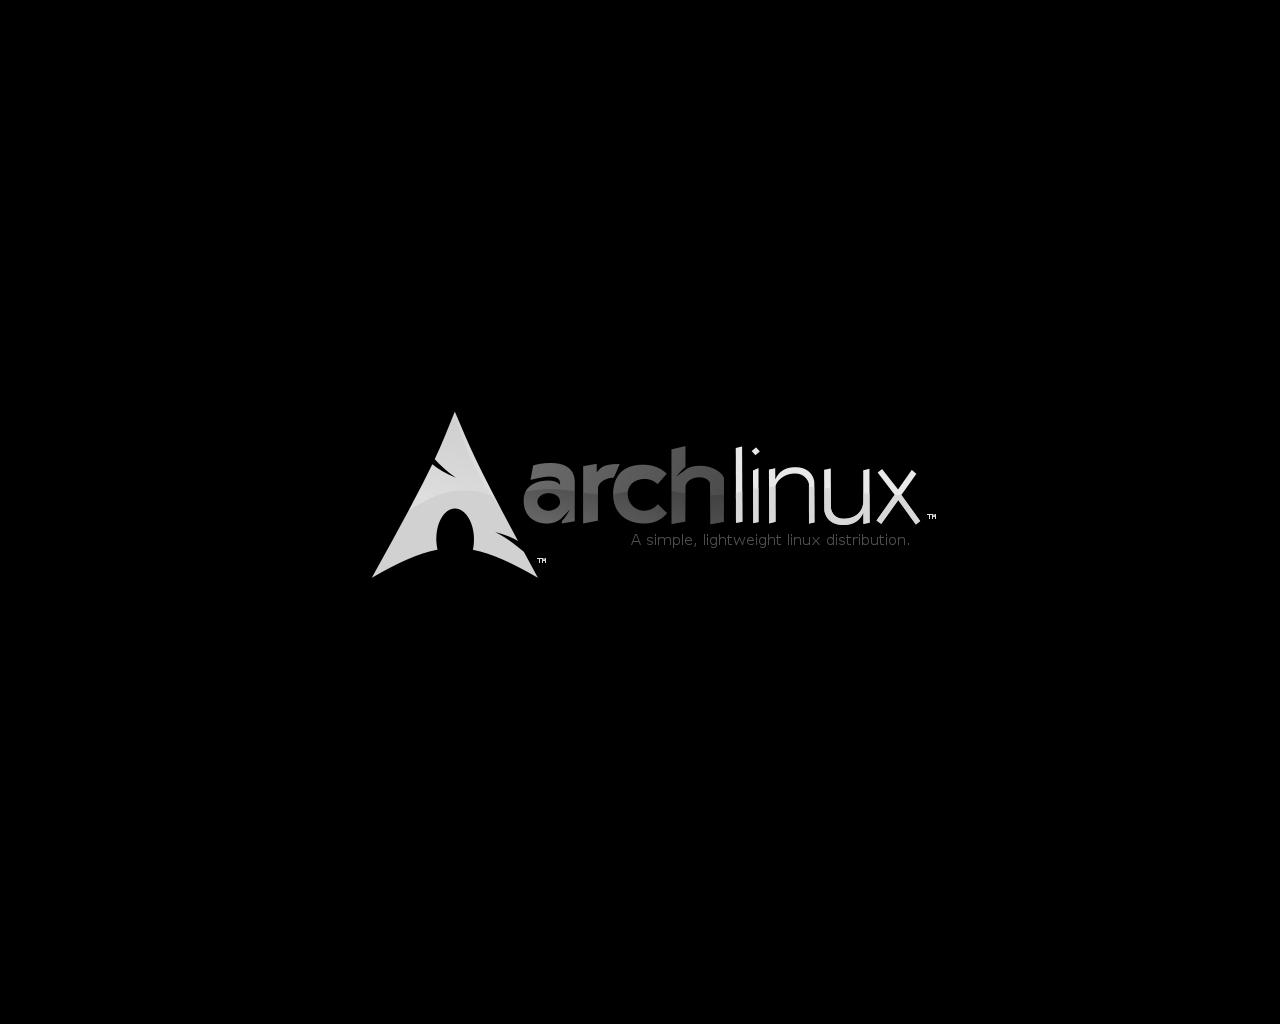 Archlinux_wallpaper_-_greyscle by platinummonkey